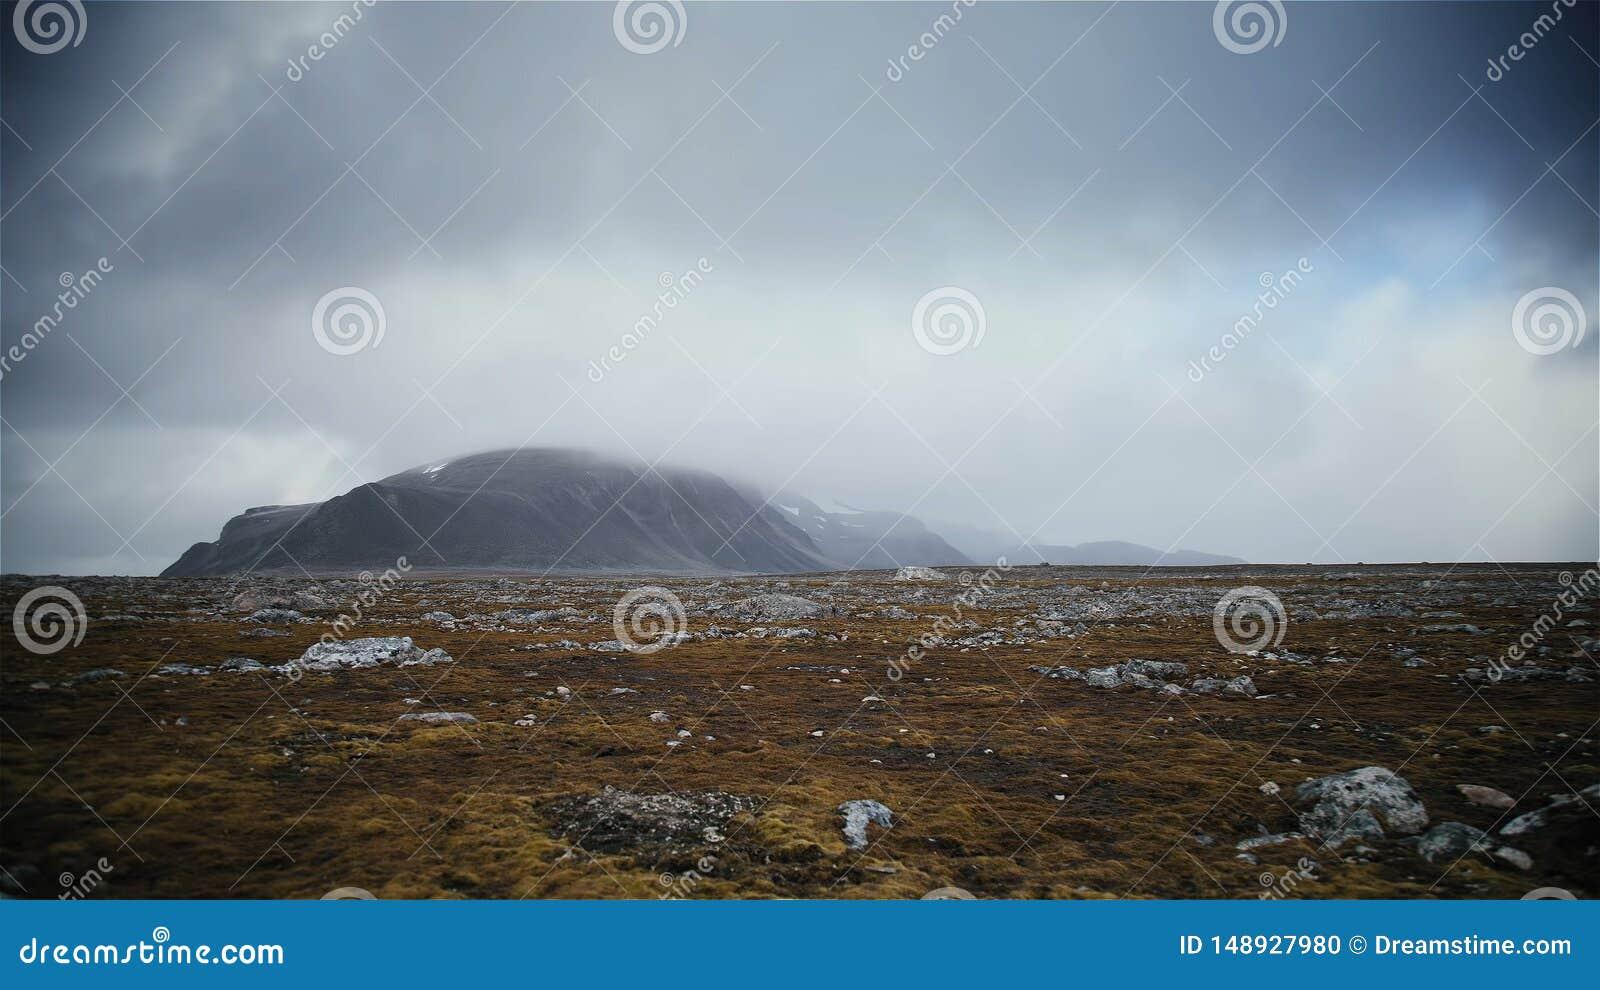 Grote mooie bergen met witte mist